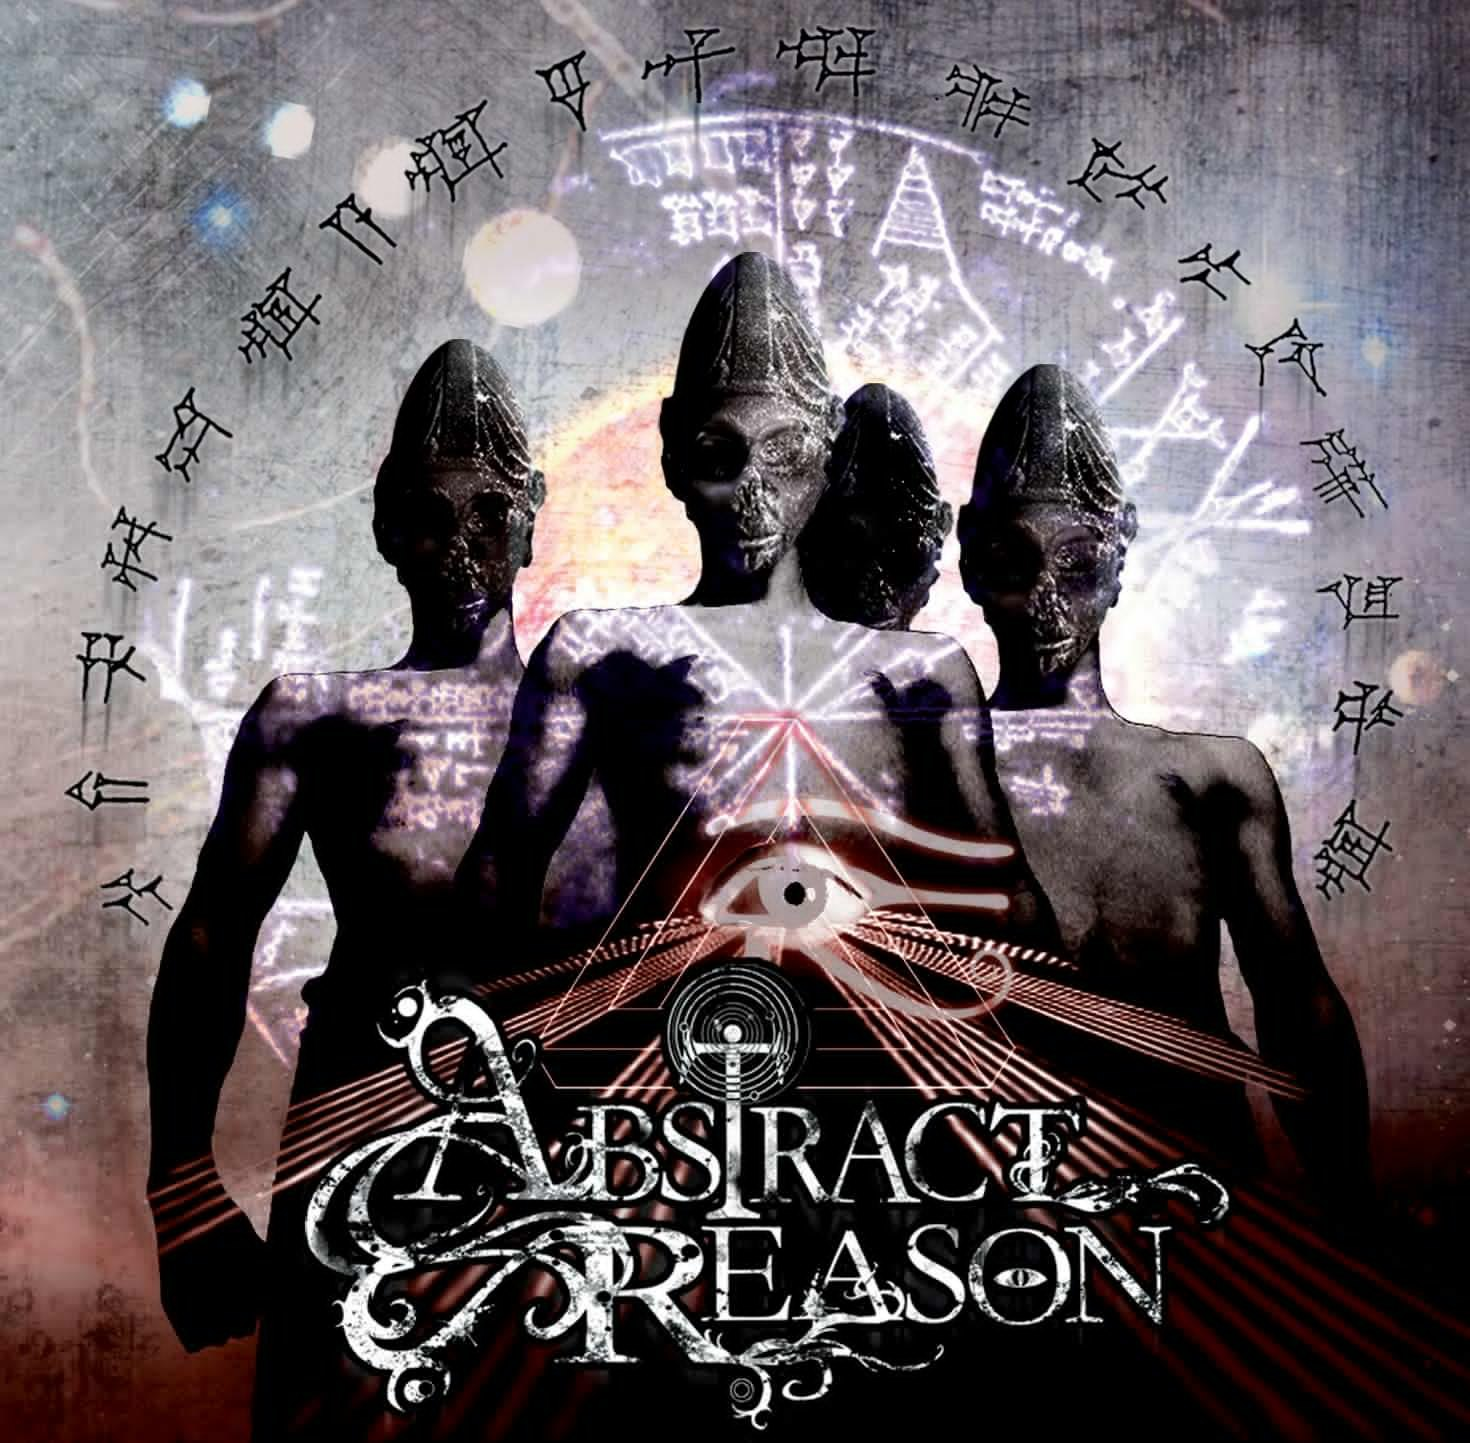 Abstract Reason - Self-Titled [EP] (2012)